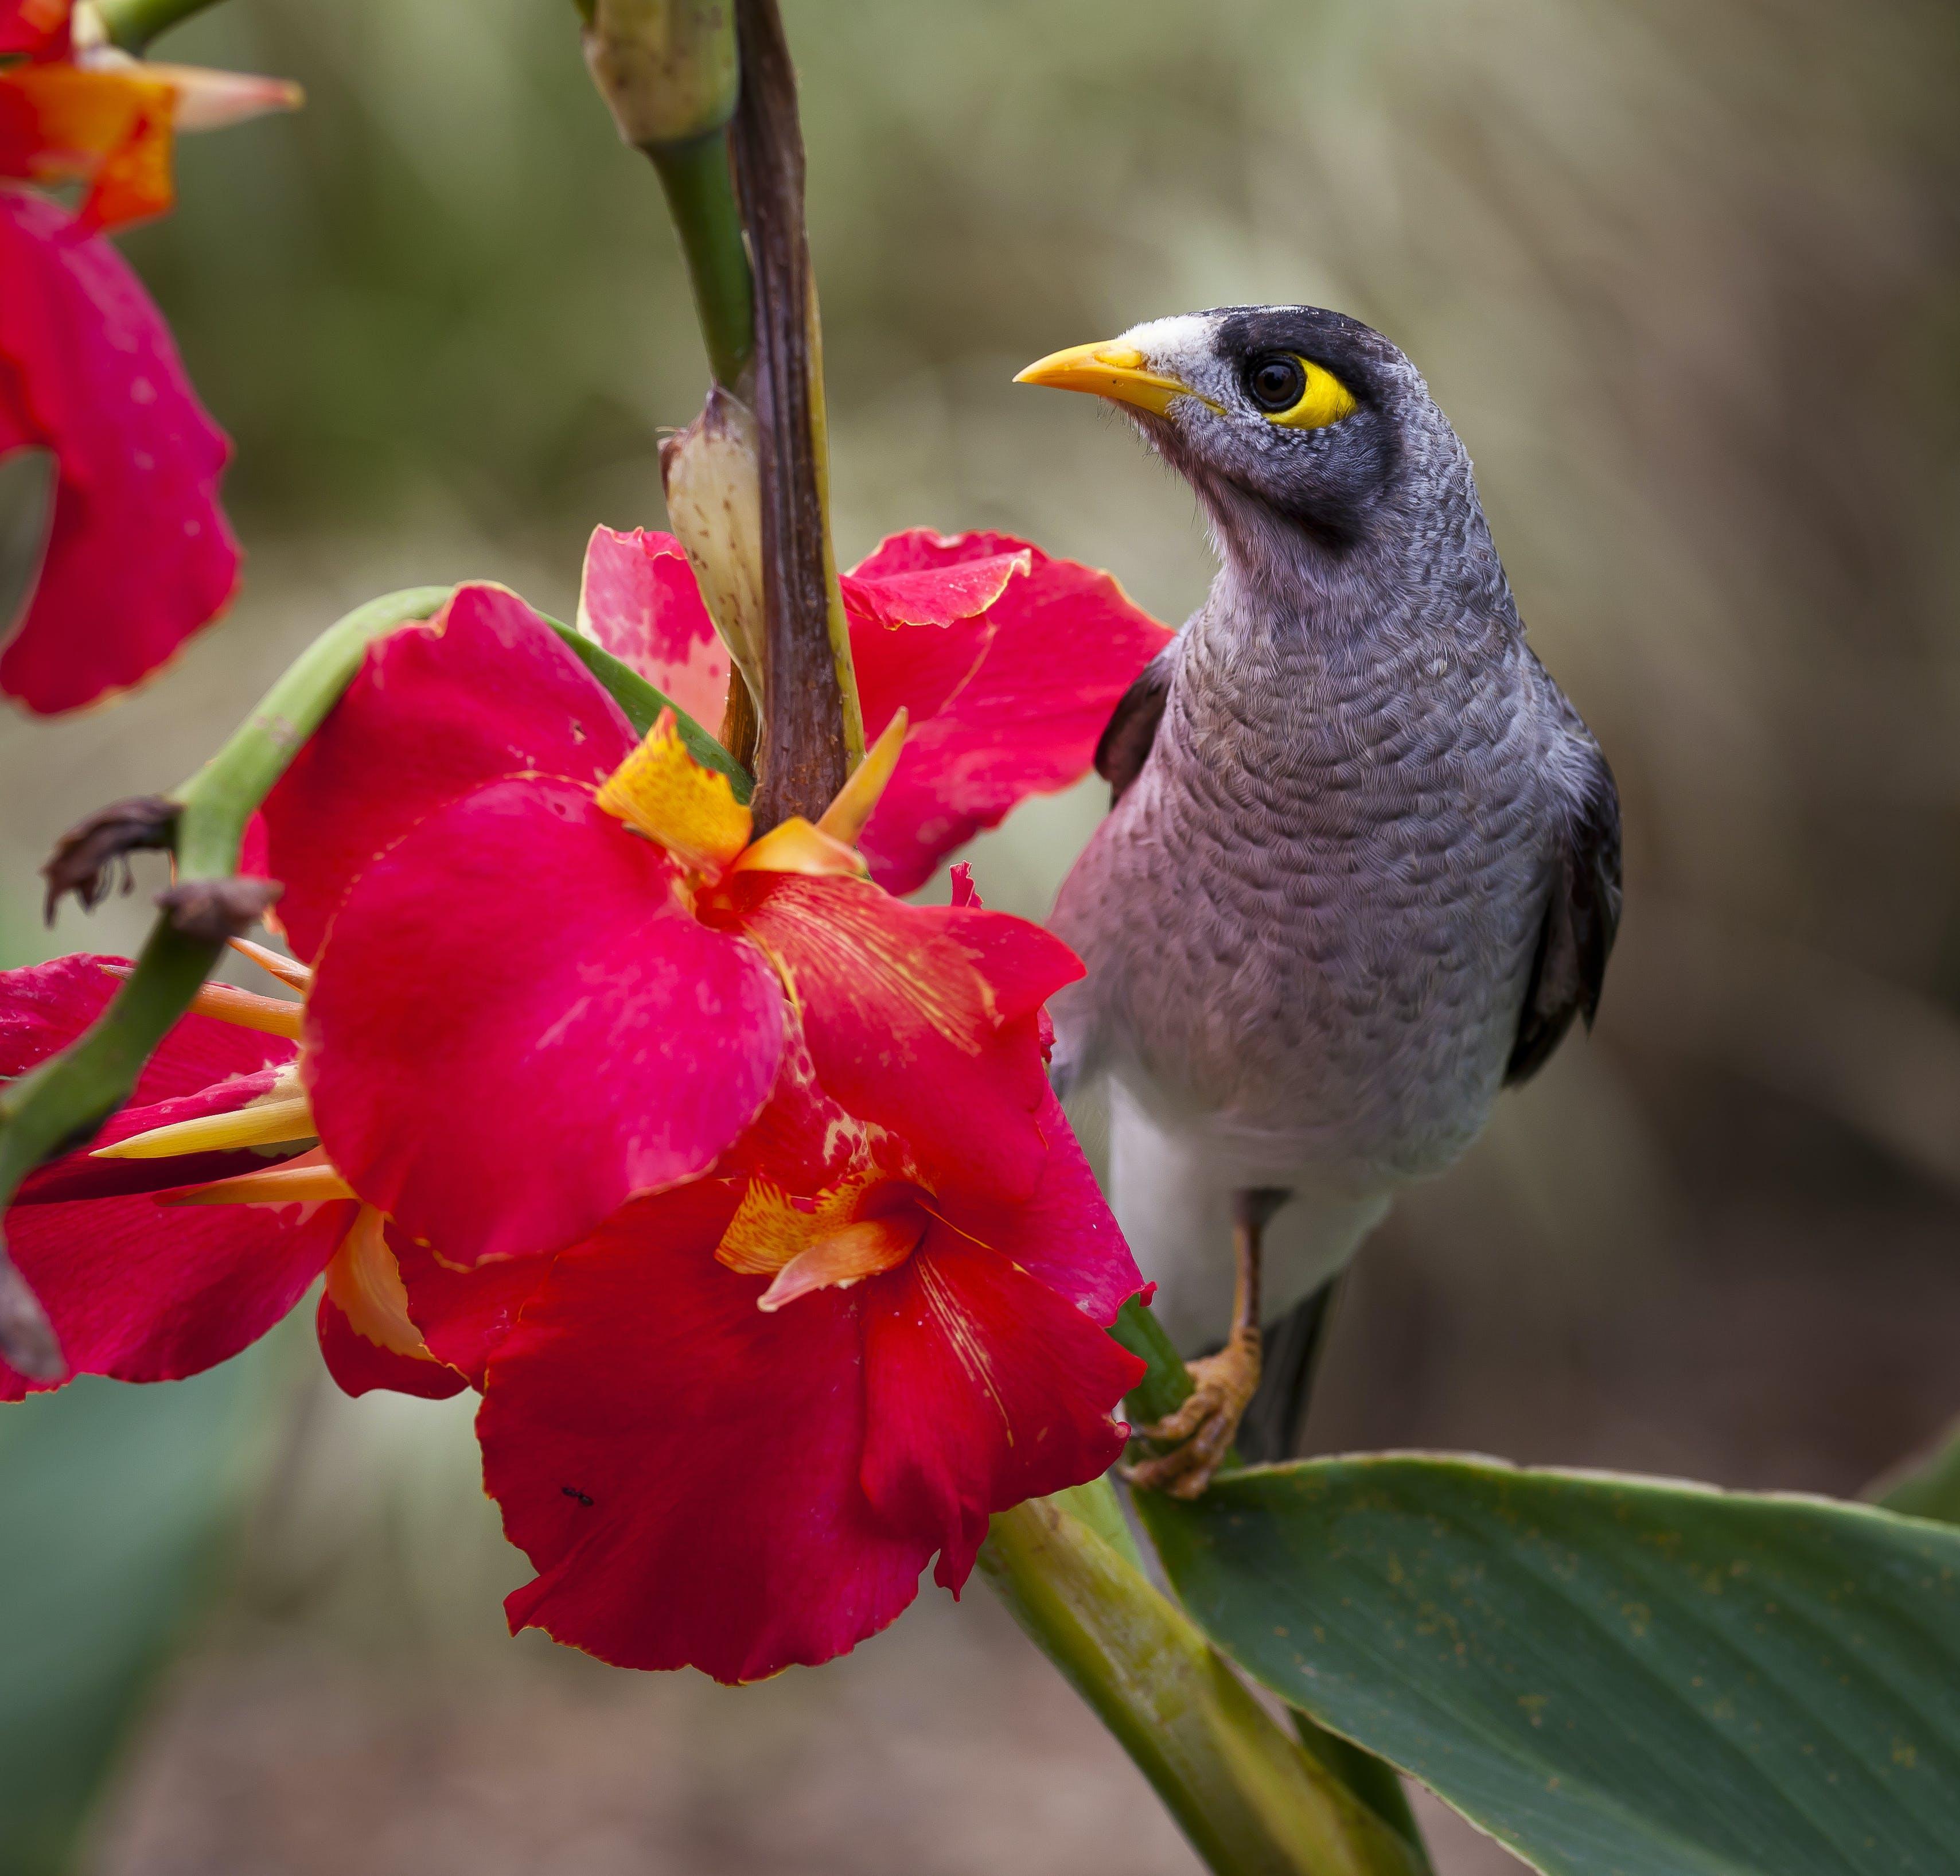 Black Grey White Yellow Bird Near on Pink Petal Flower